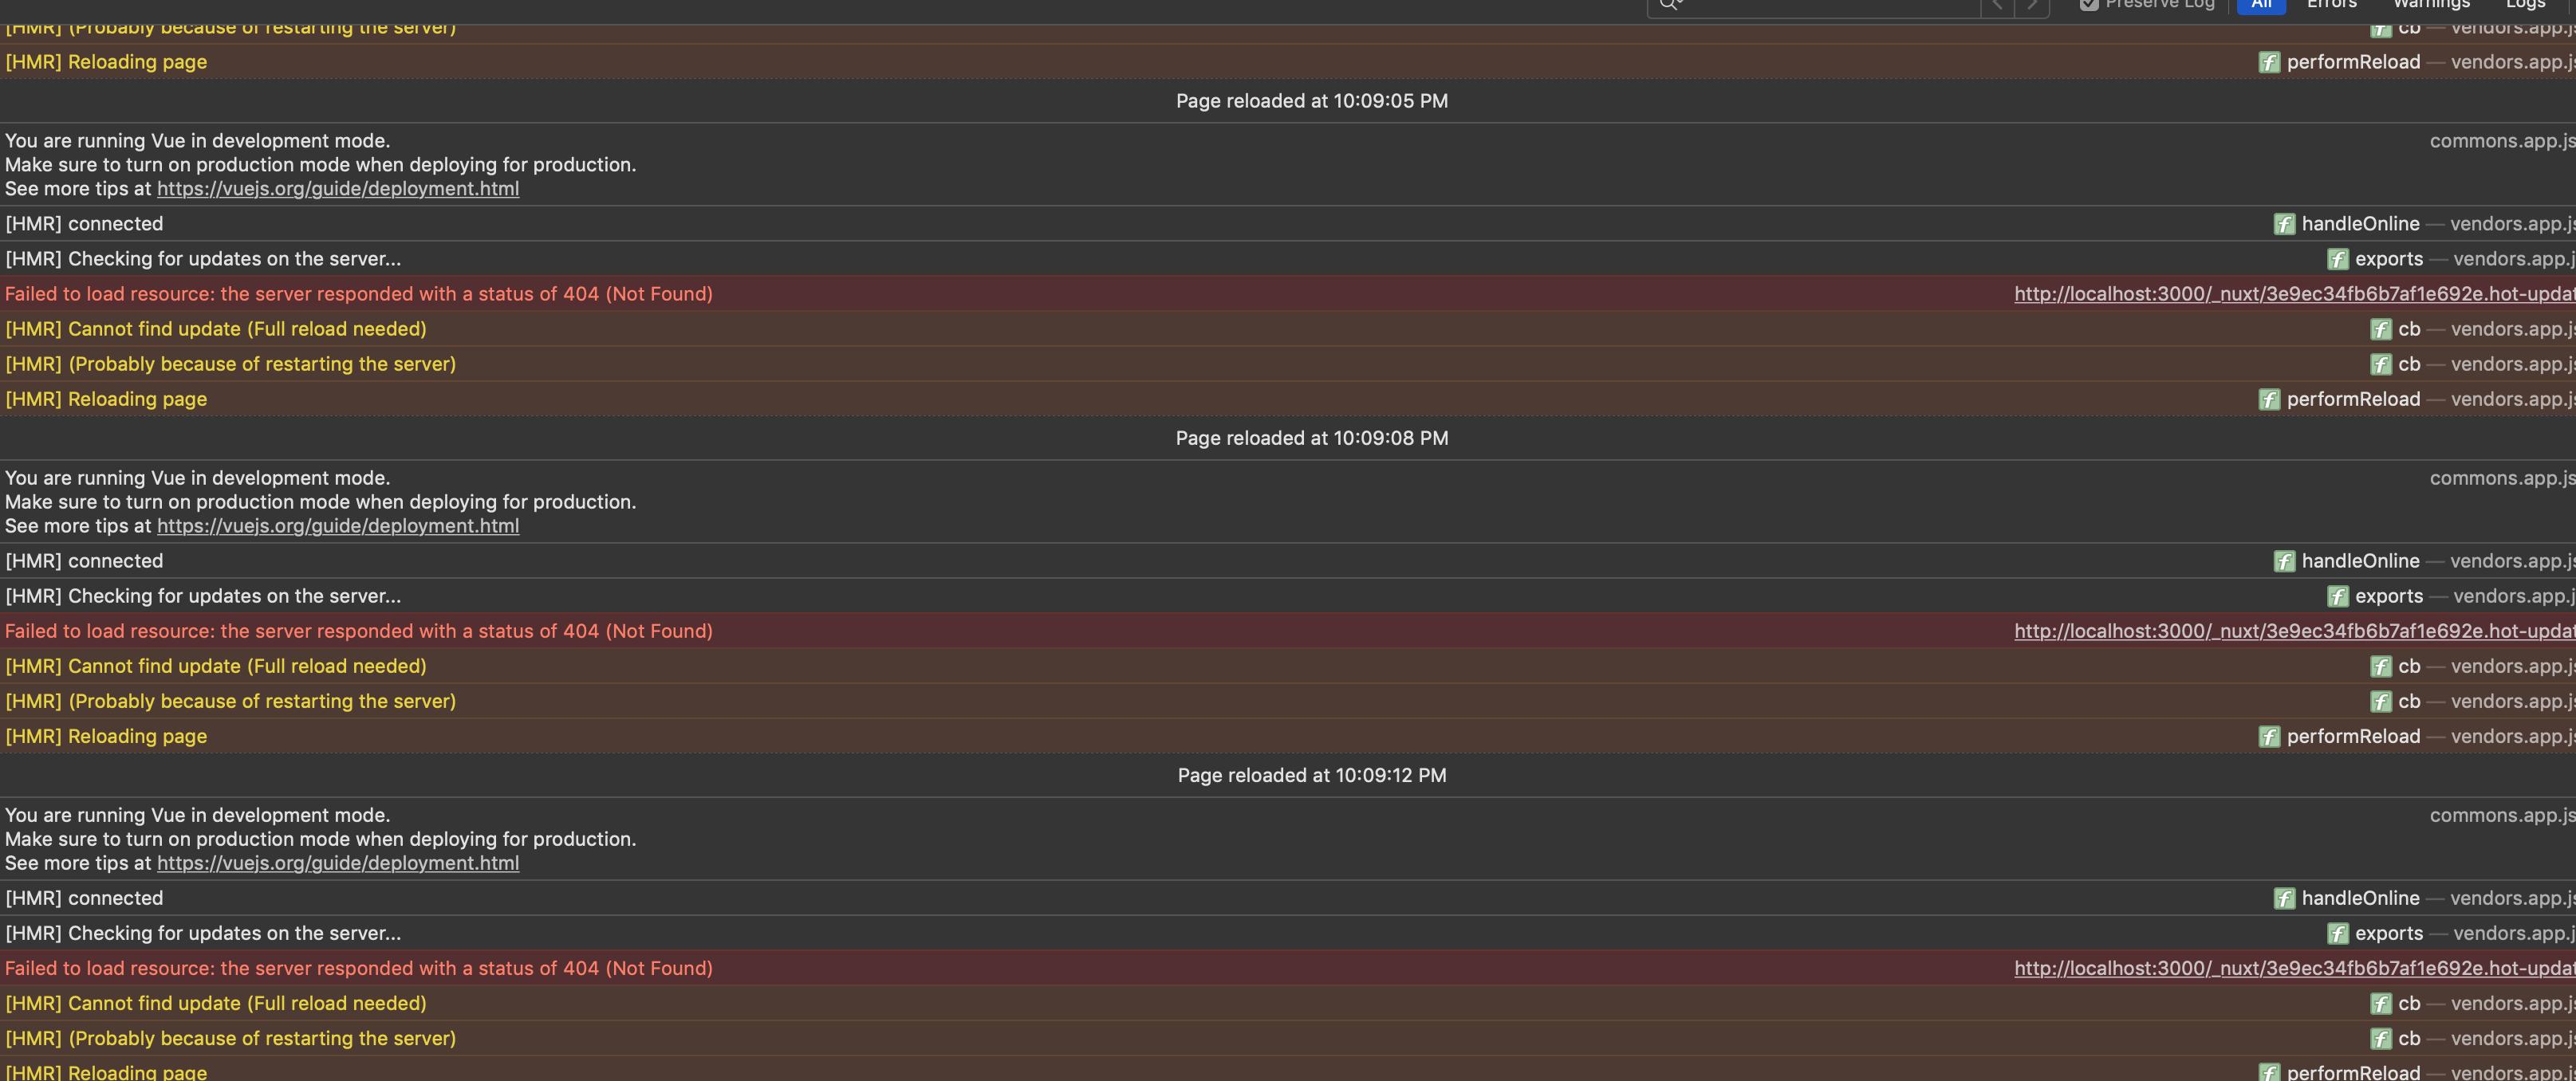 screenshot 2018-12-29 at 10 09 14 pm